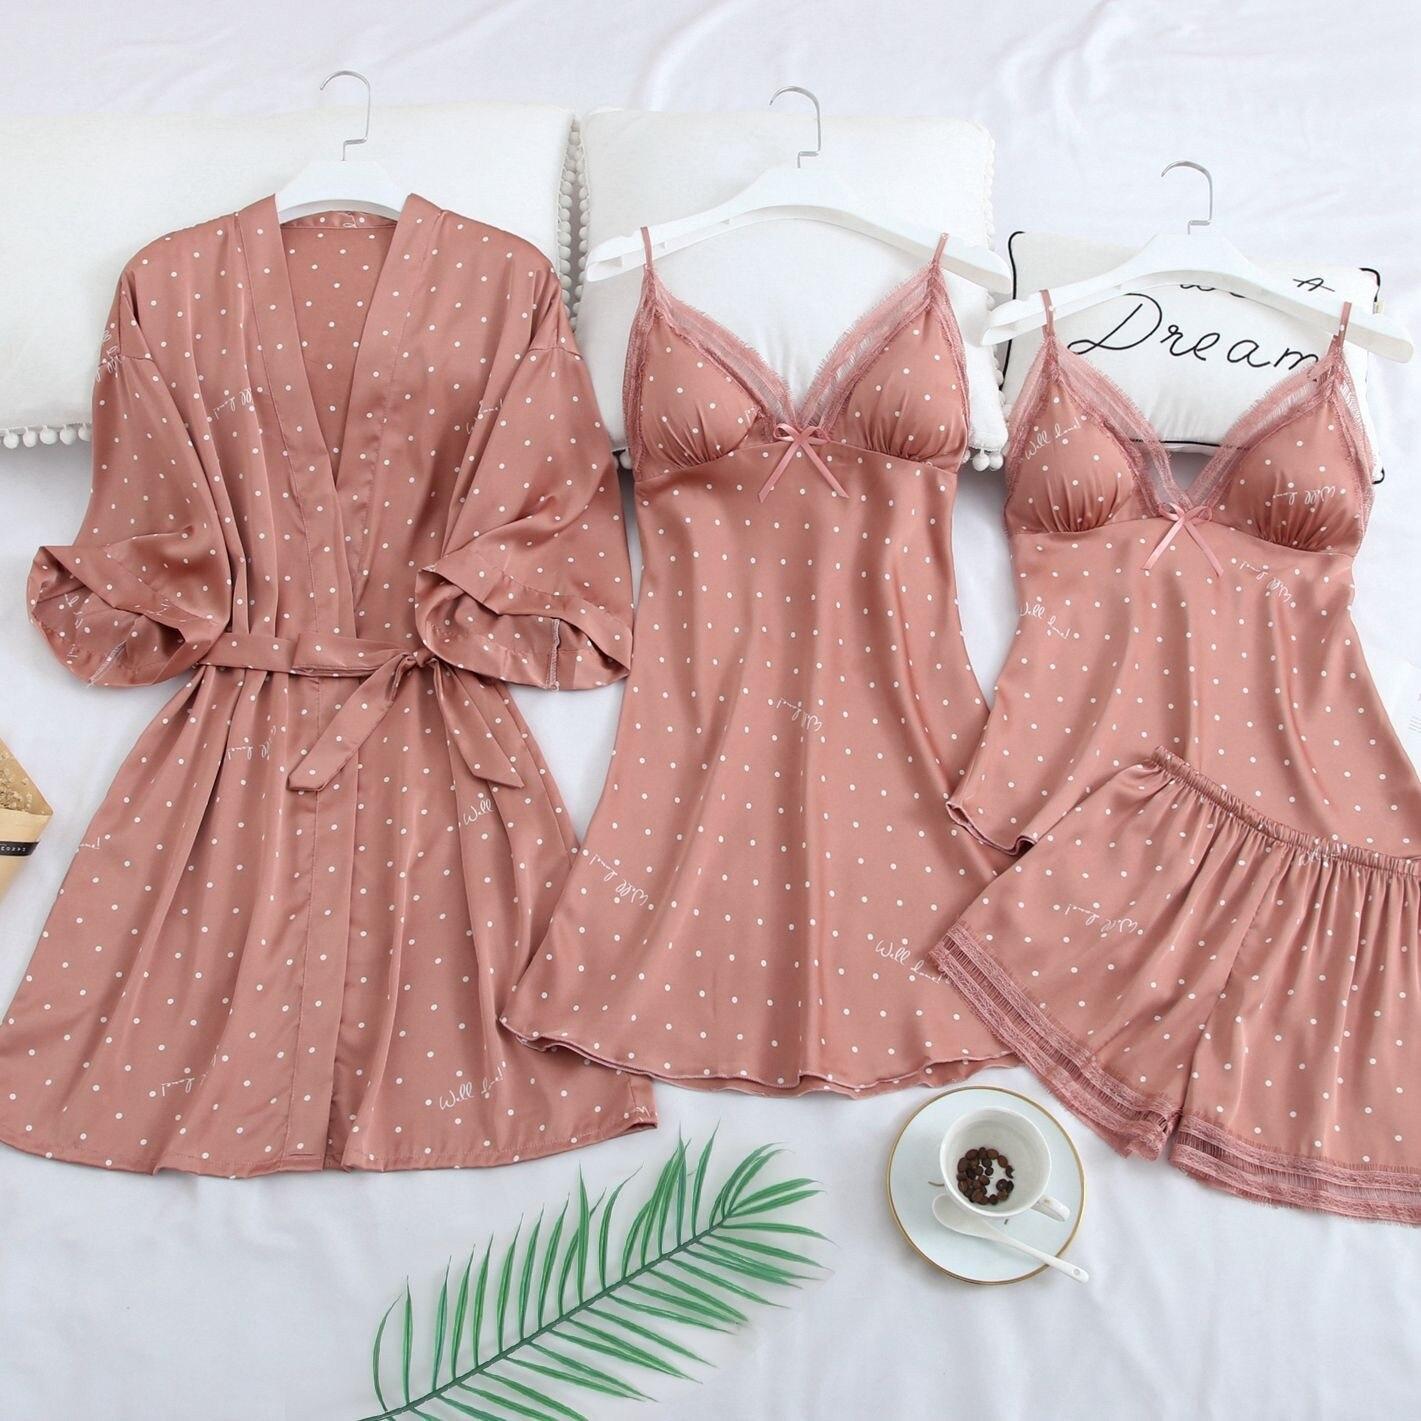 Pink Print Dot Wedding Robe Set Sleepwear Nightgown Nightdress Soft Homewear Home Clothing  silk robes for women